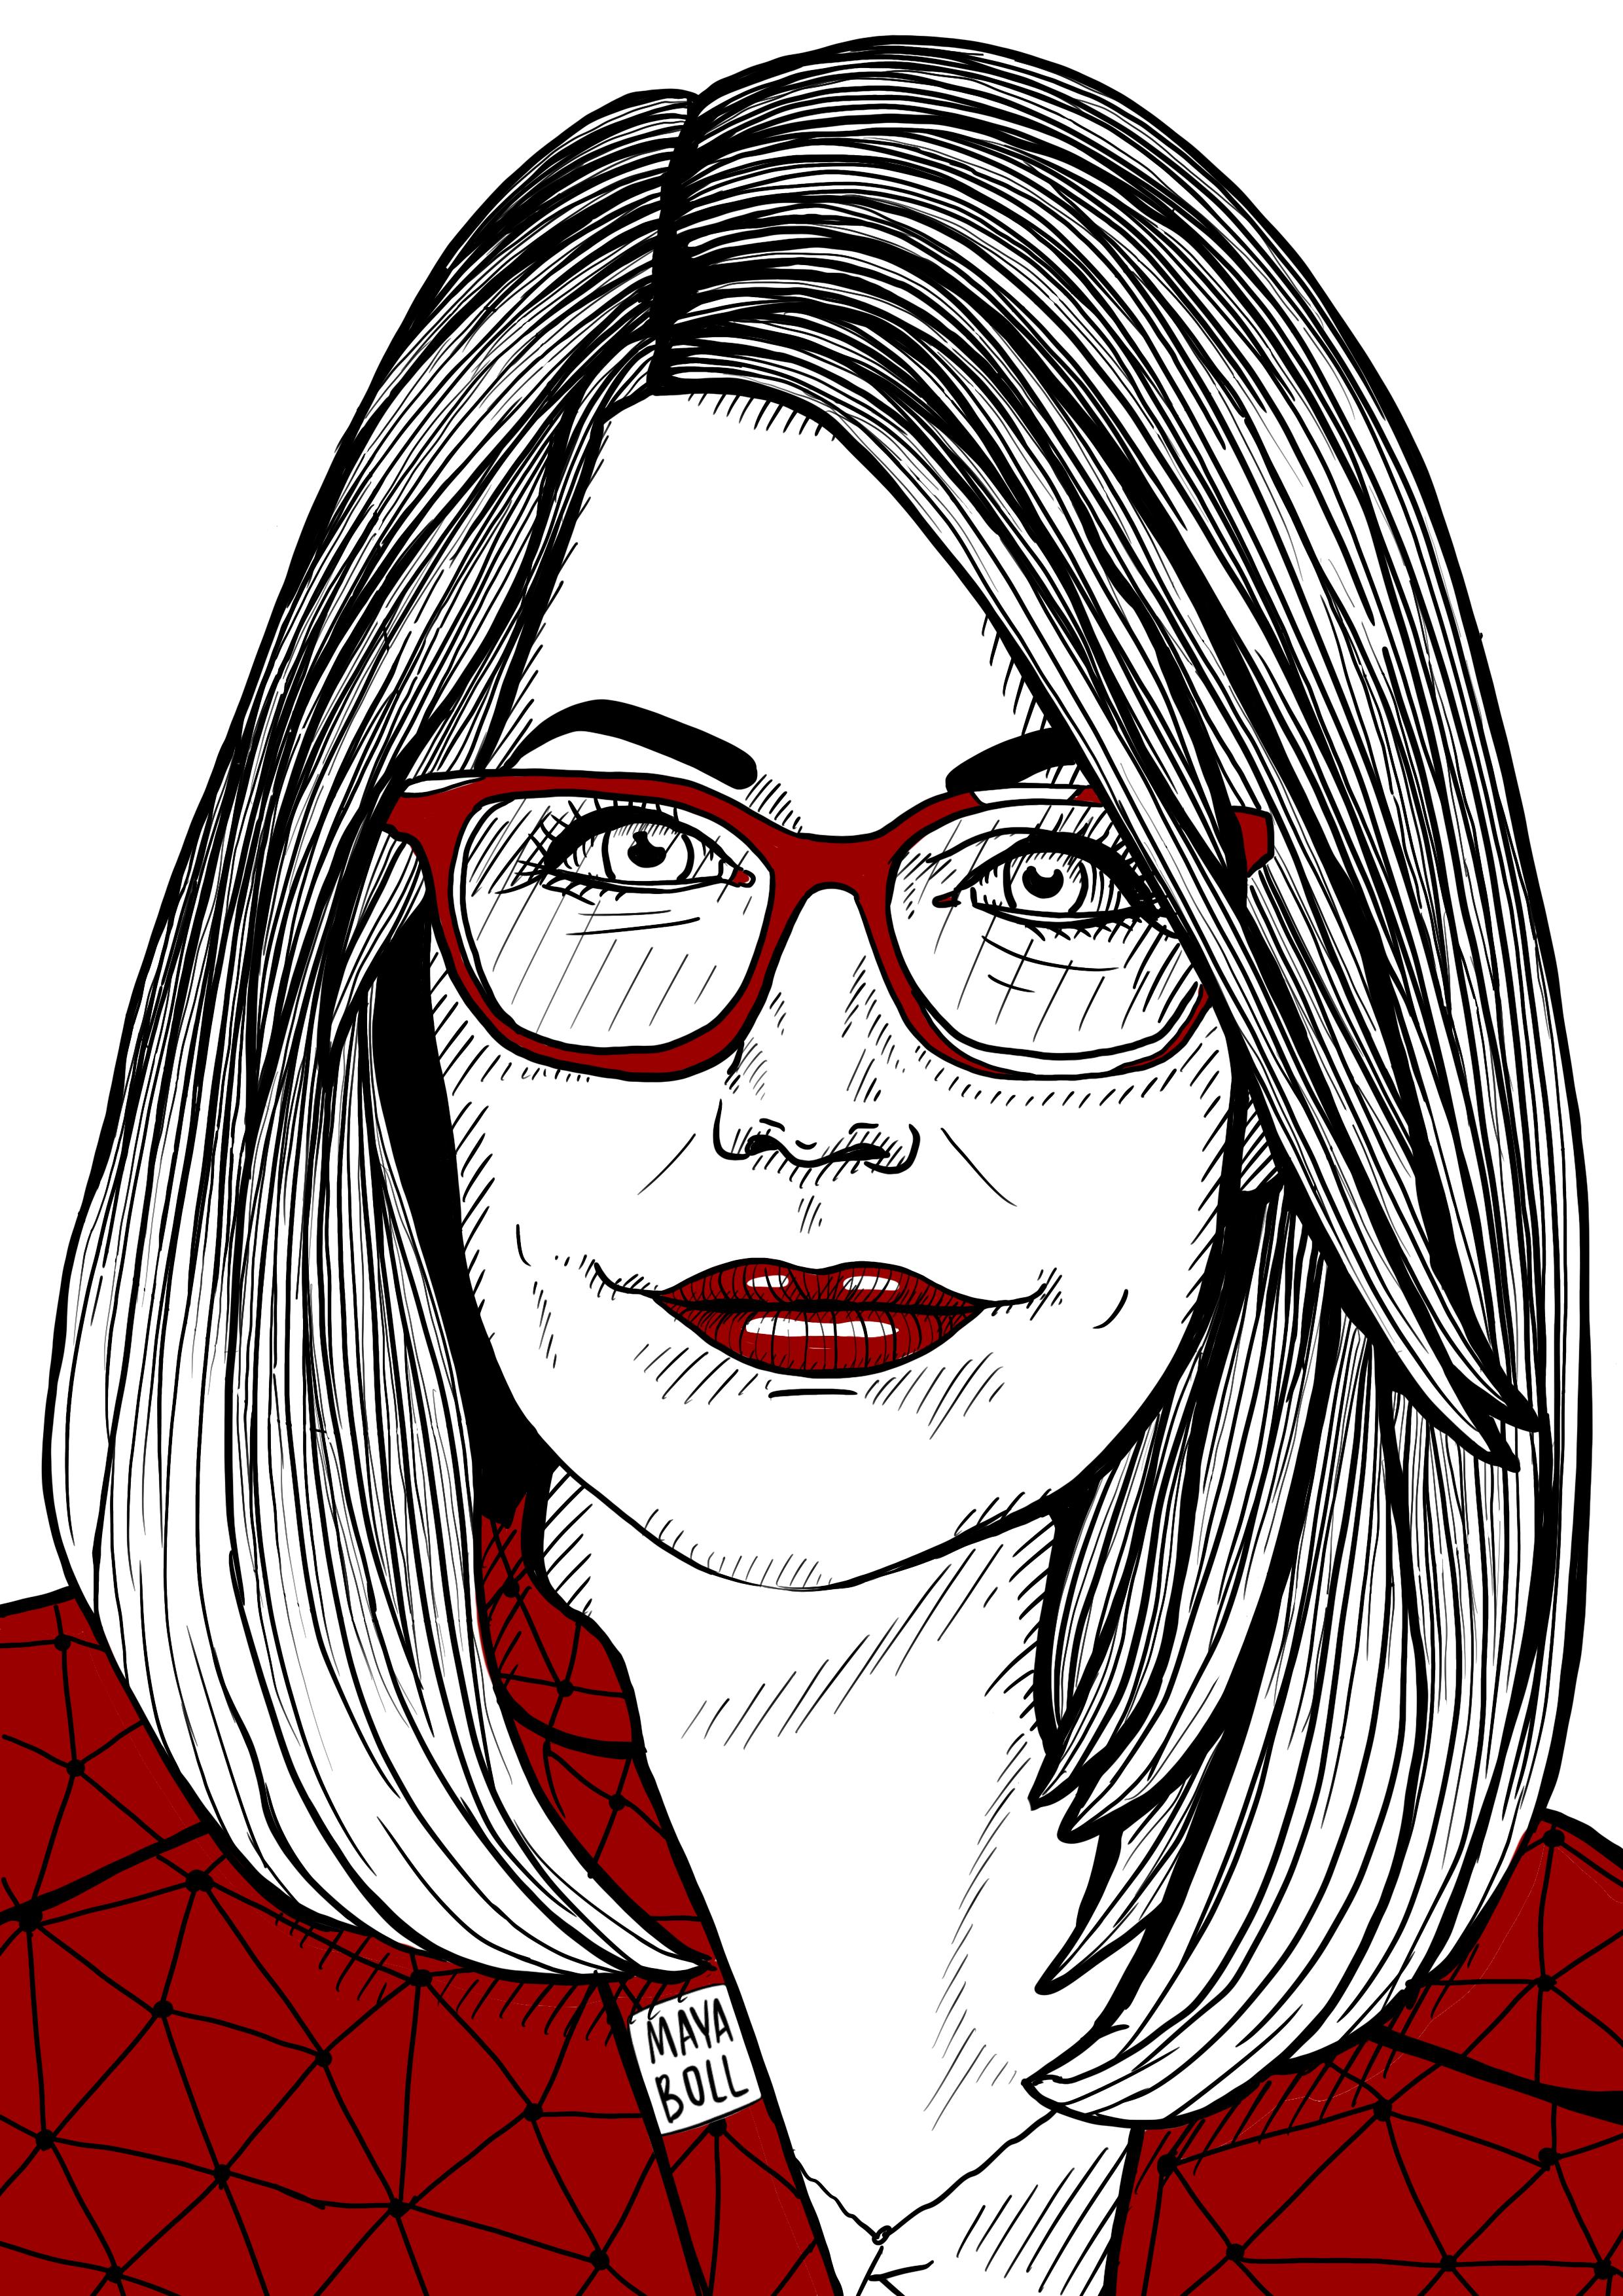 Kristina Grancaric